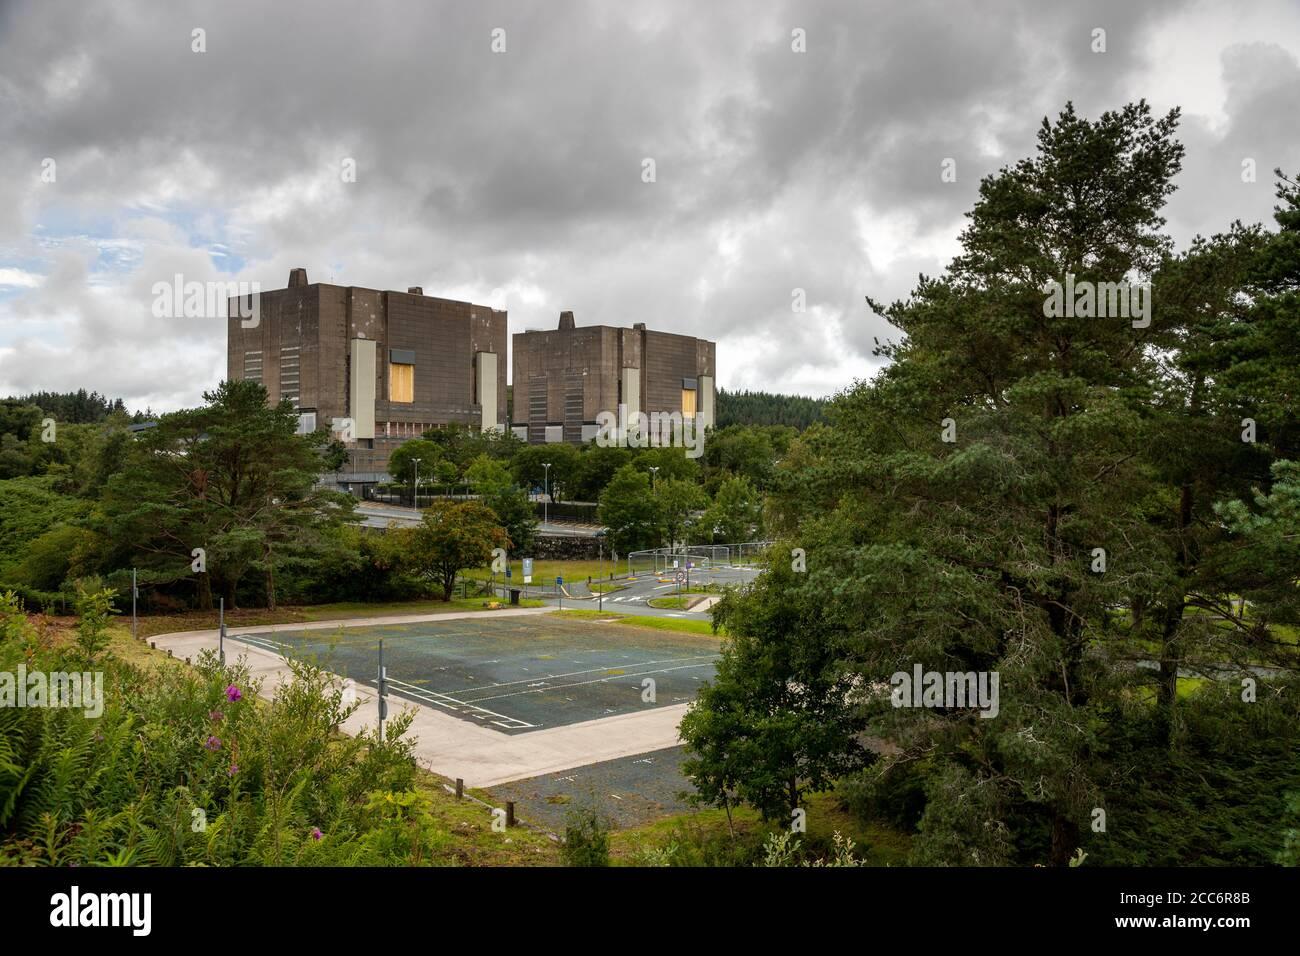 Trawsfynydd magnox nuclear power station, Wales Stock Photo